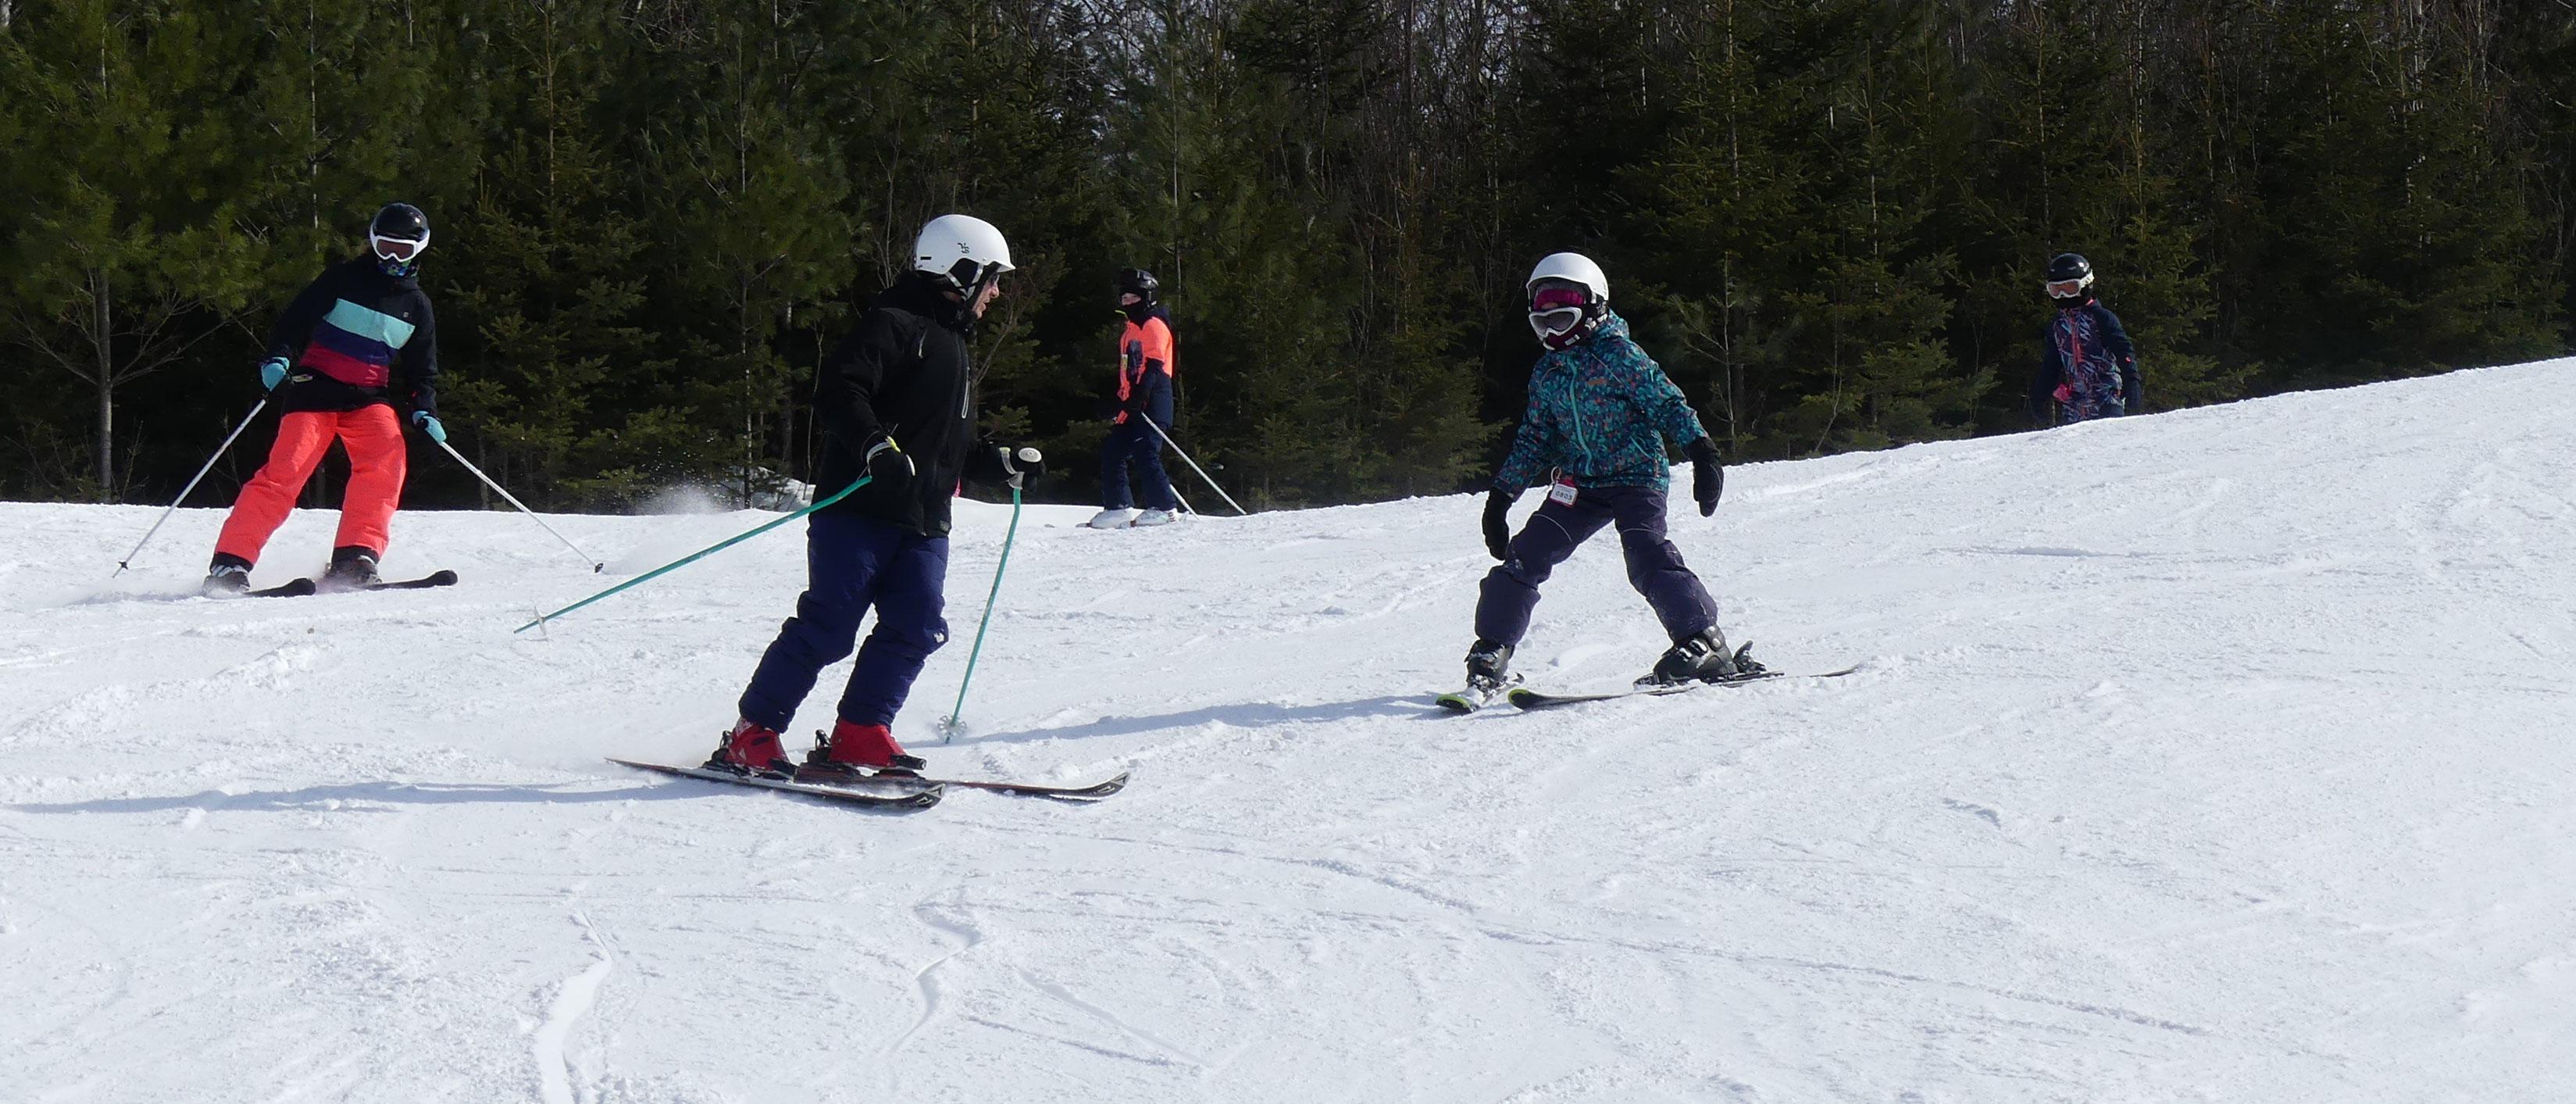 Ski alpin au centre de ski Saint-Georges